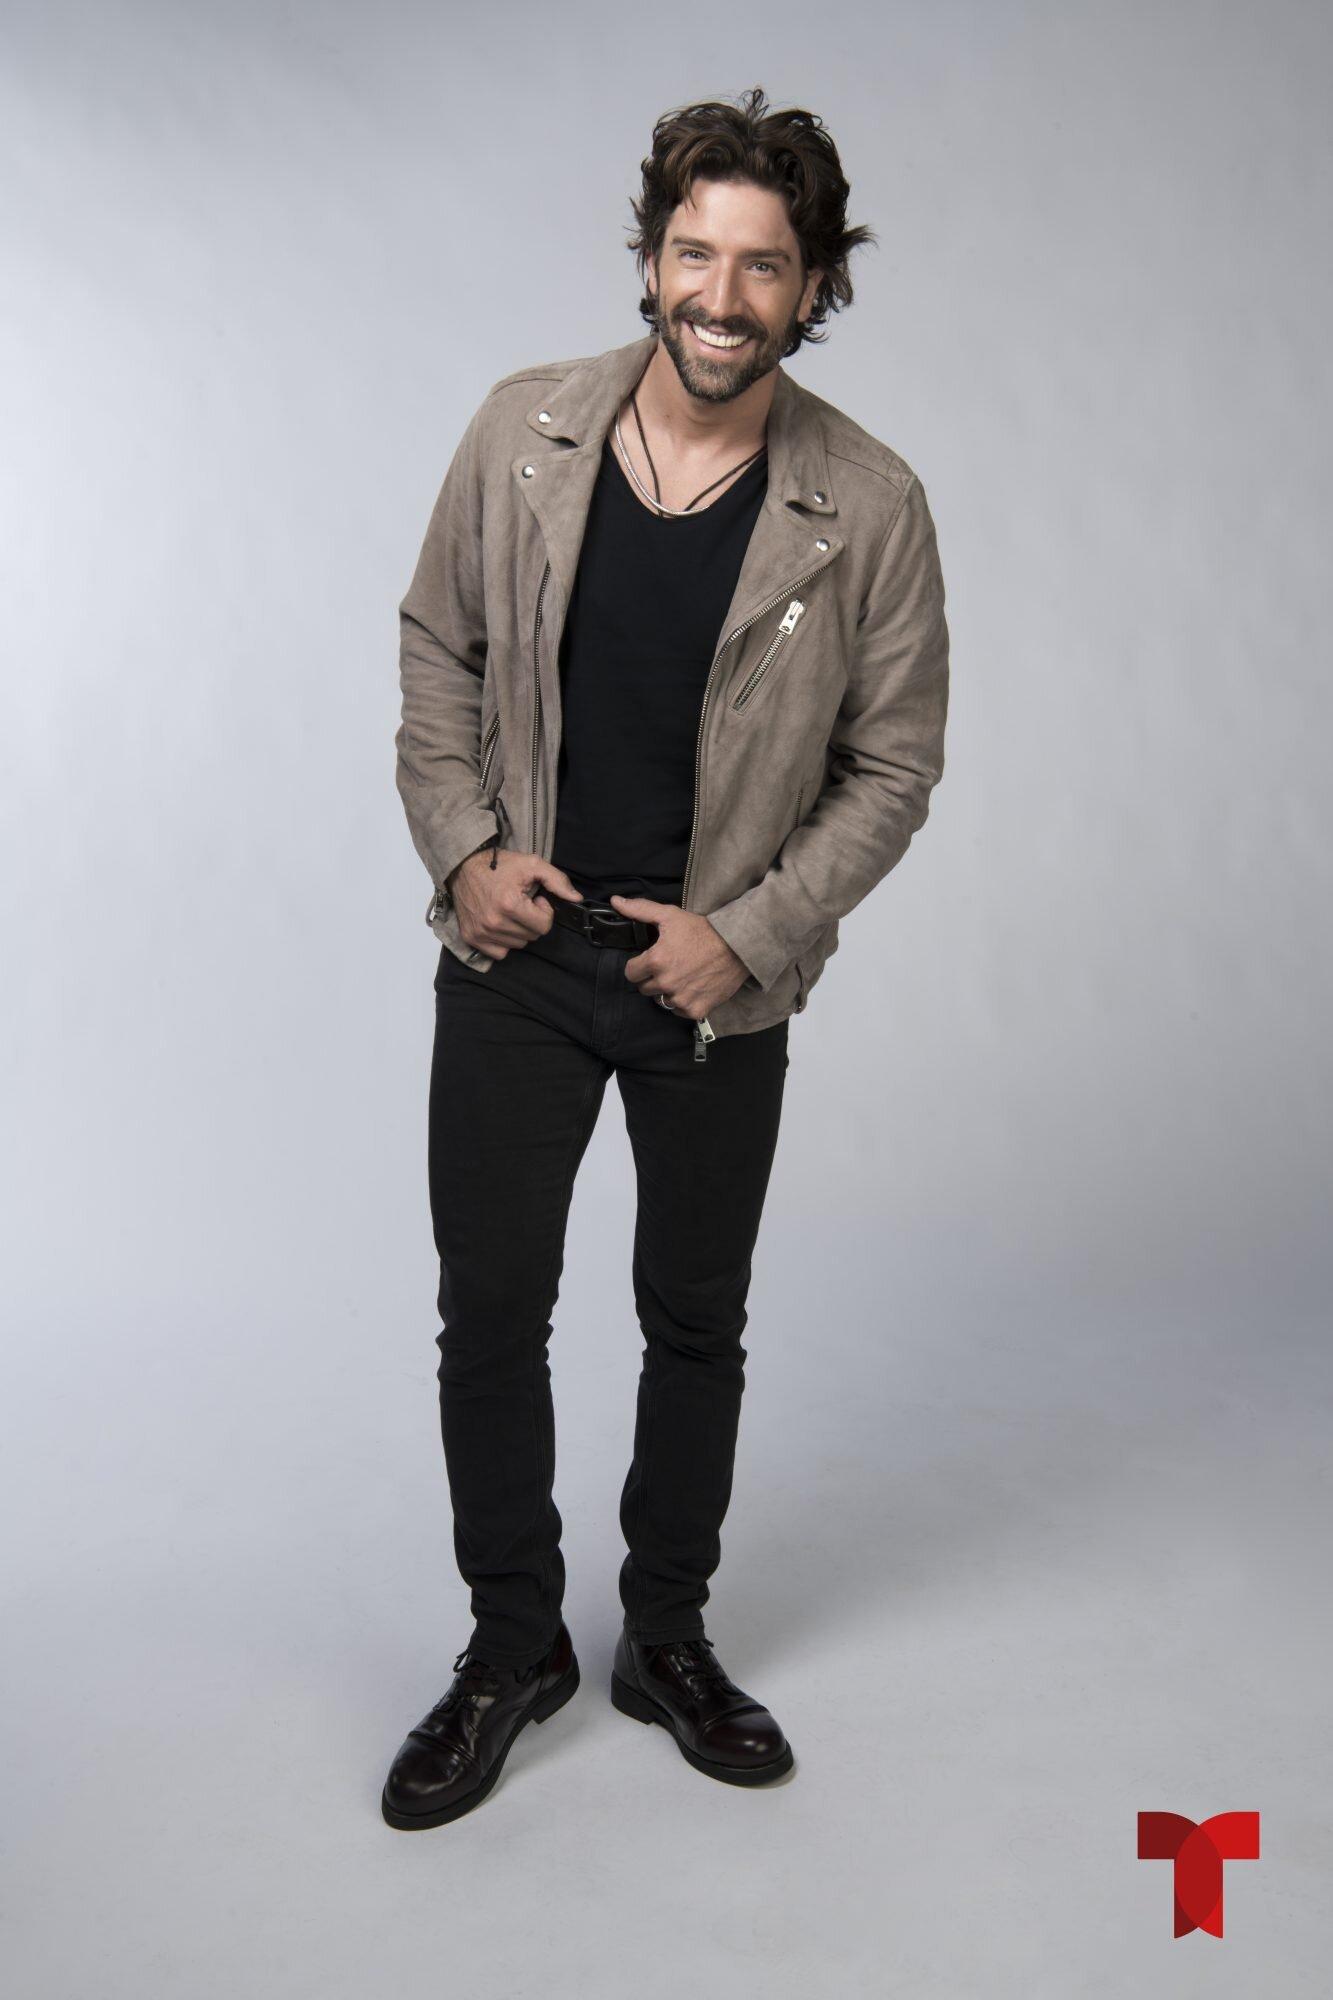 David Chocarro (Emiliano)